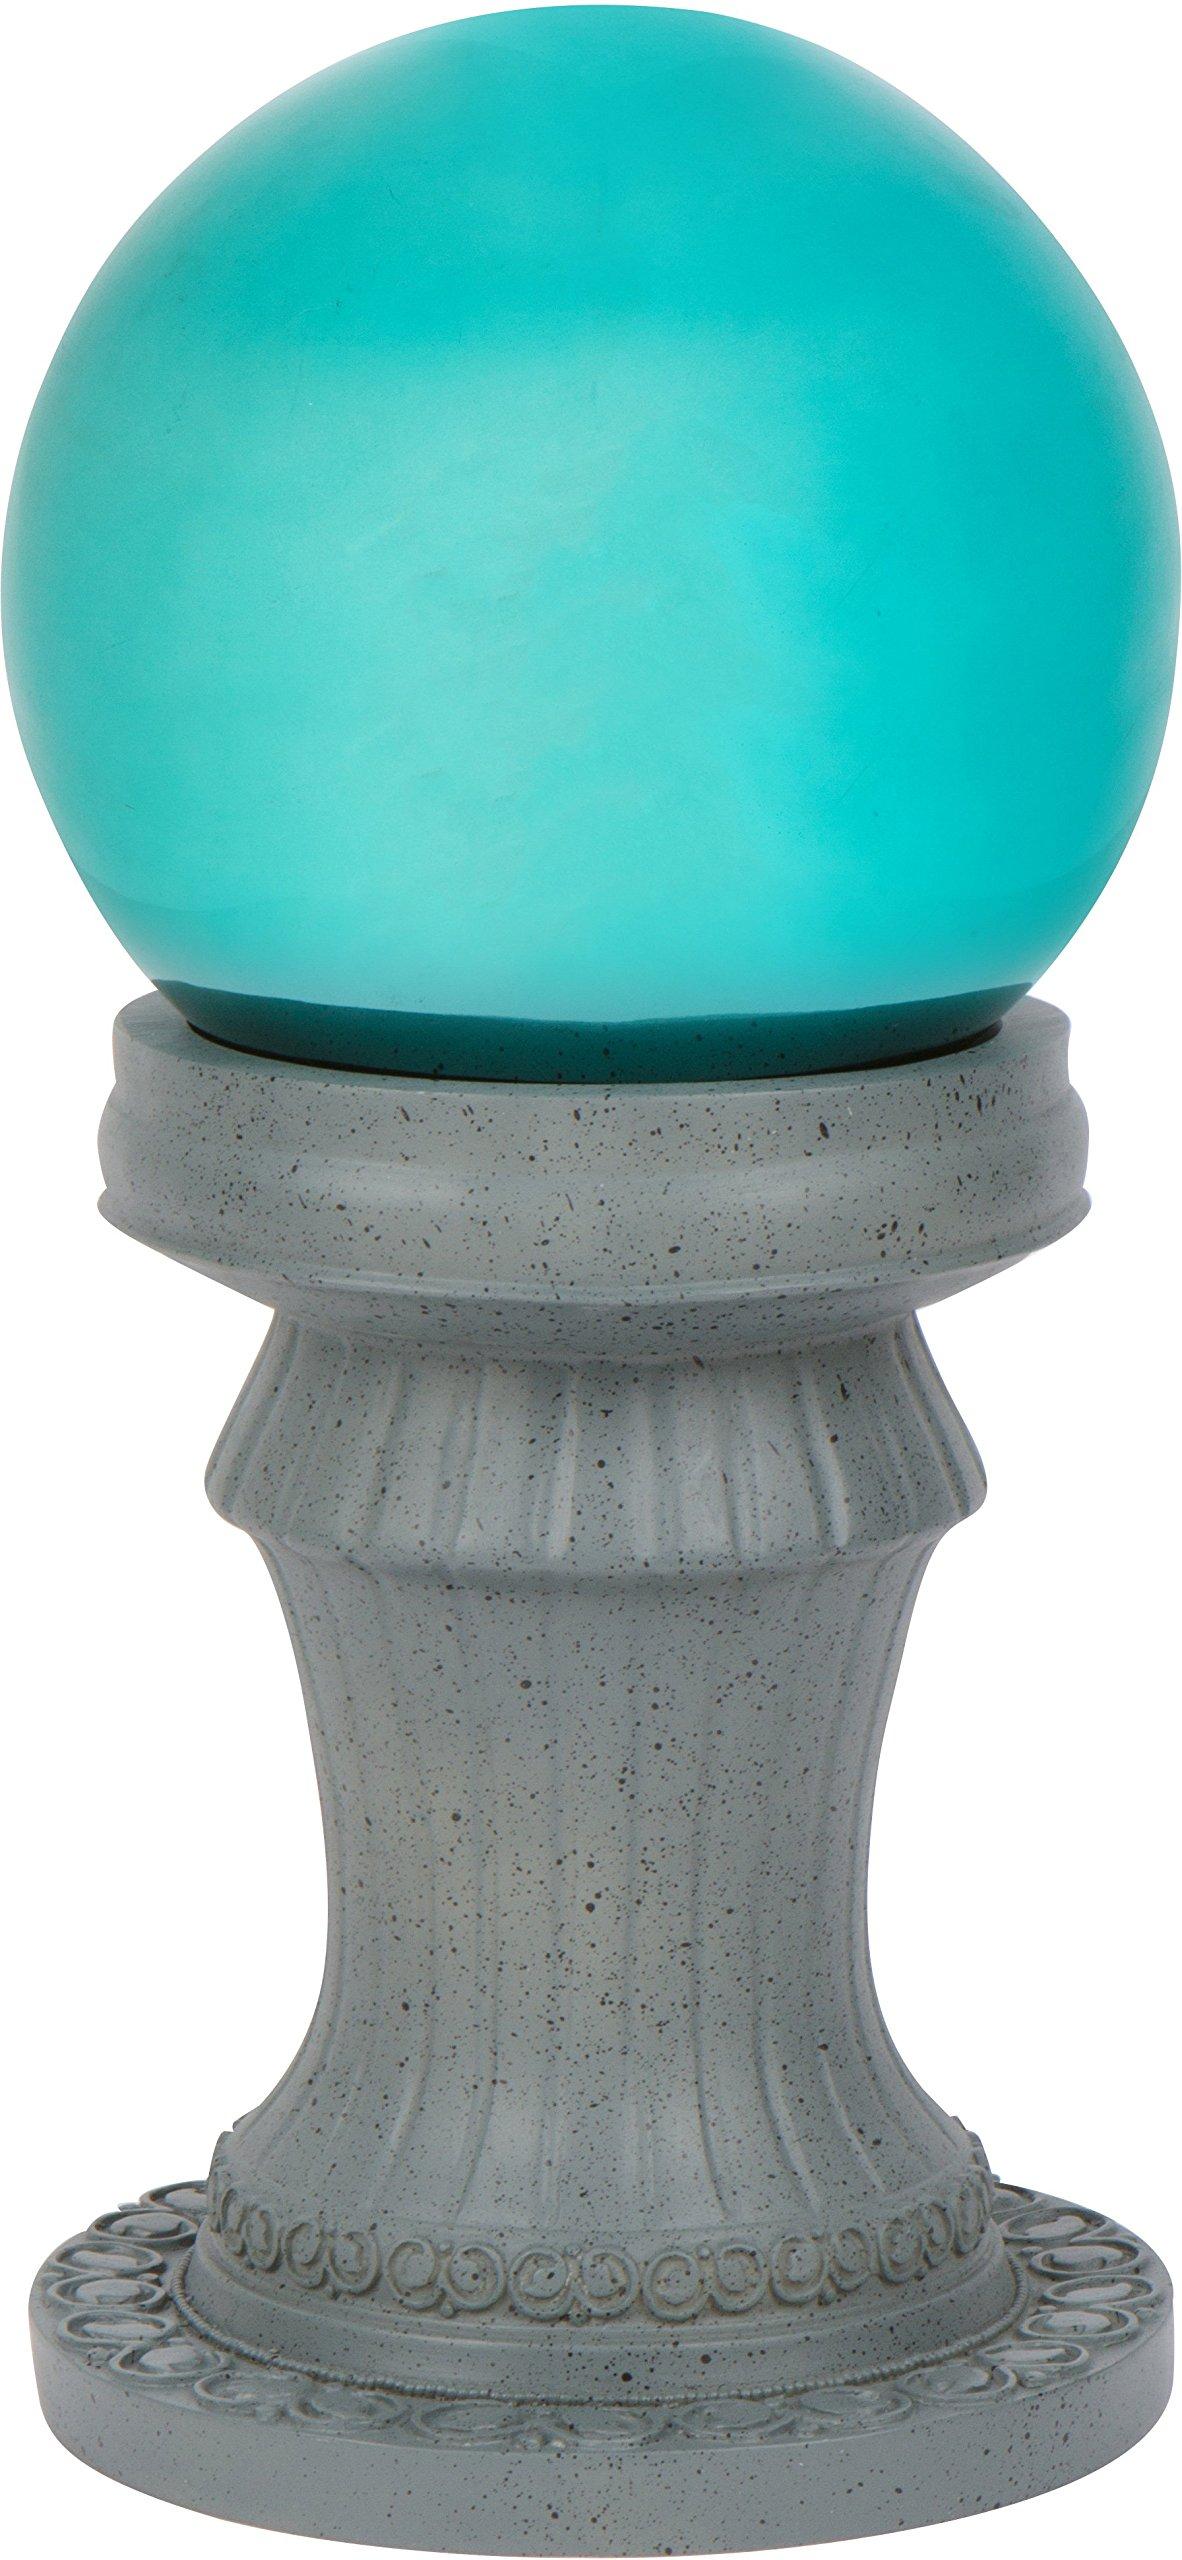 11.5'' Pedestal Gazing Ball Stand (Resin) & 10'' Gazing Ball (Blue) by Trademark Innovations